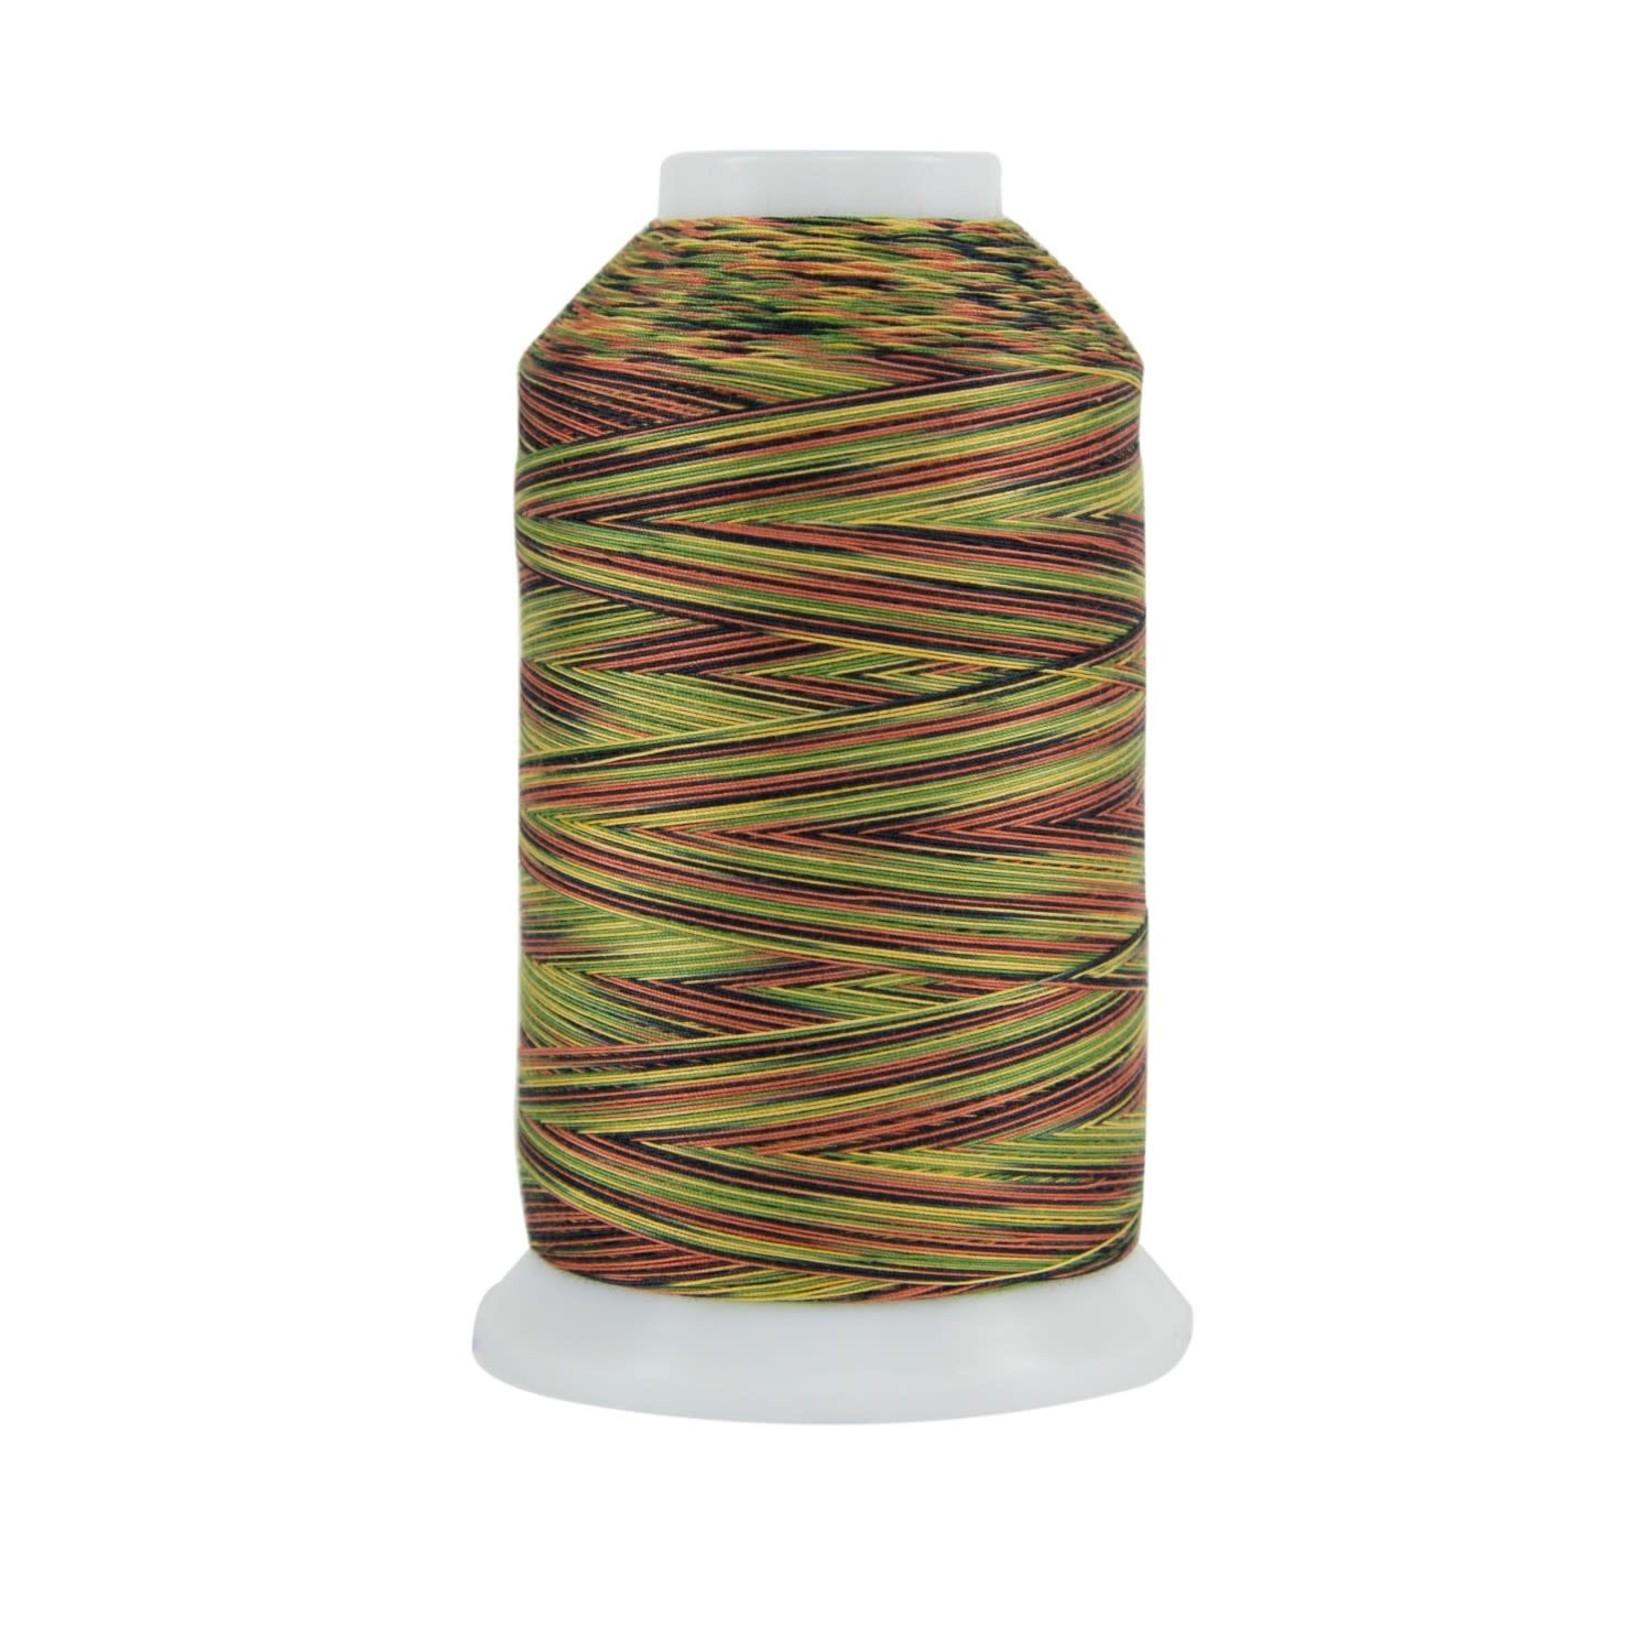 Superior Threads King Tut - #40 - 1828 m - 0941 Old Giza